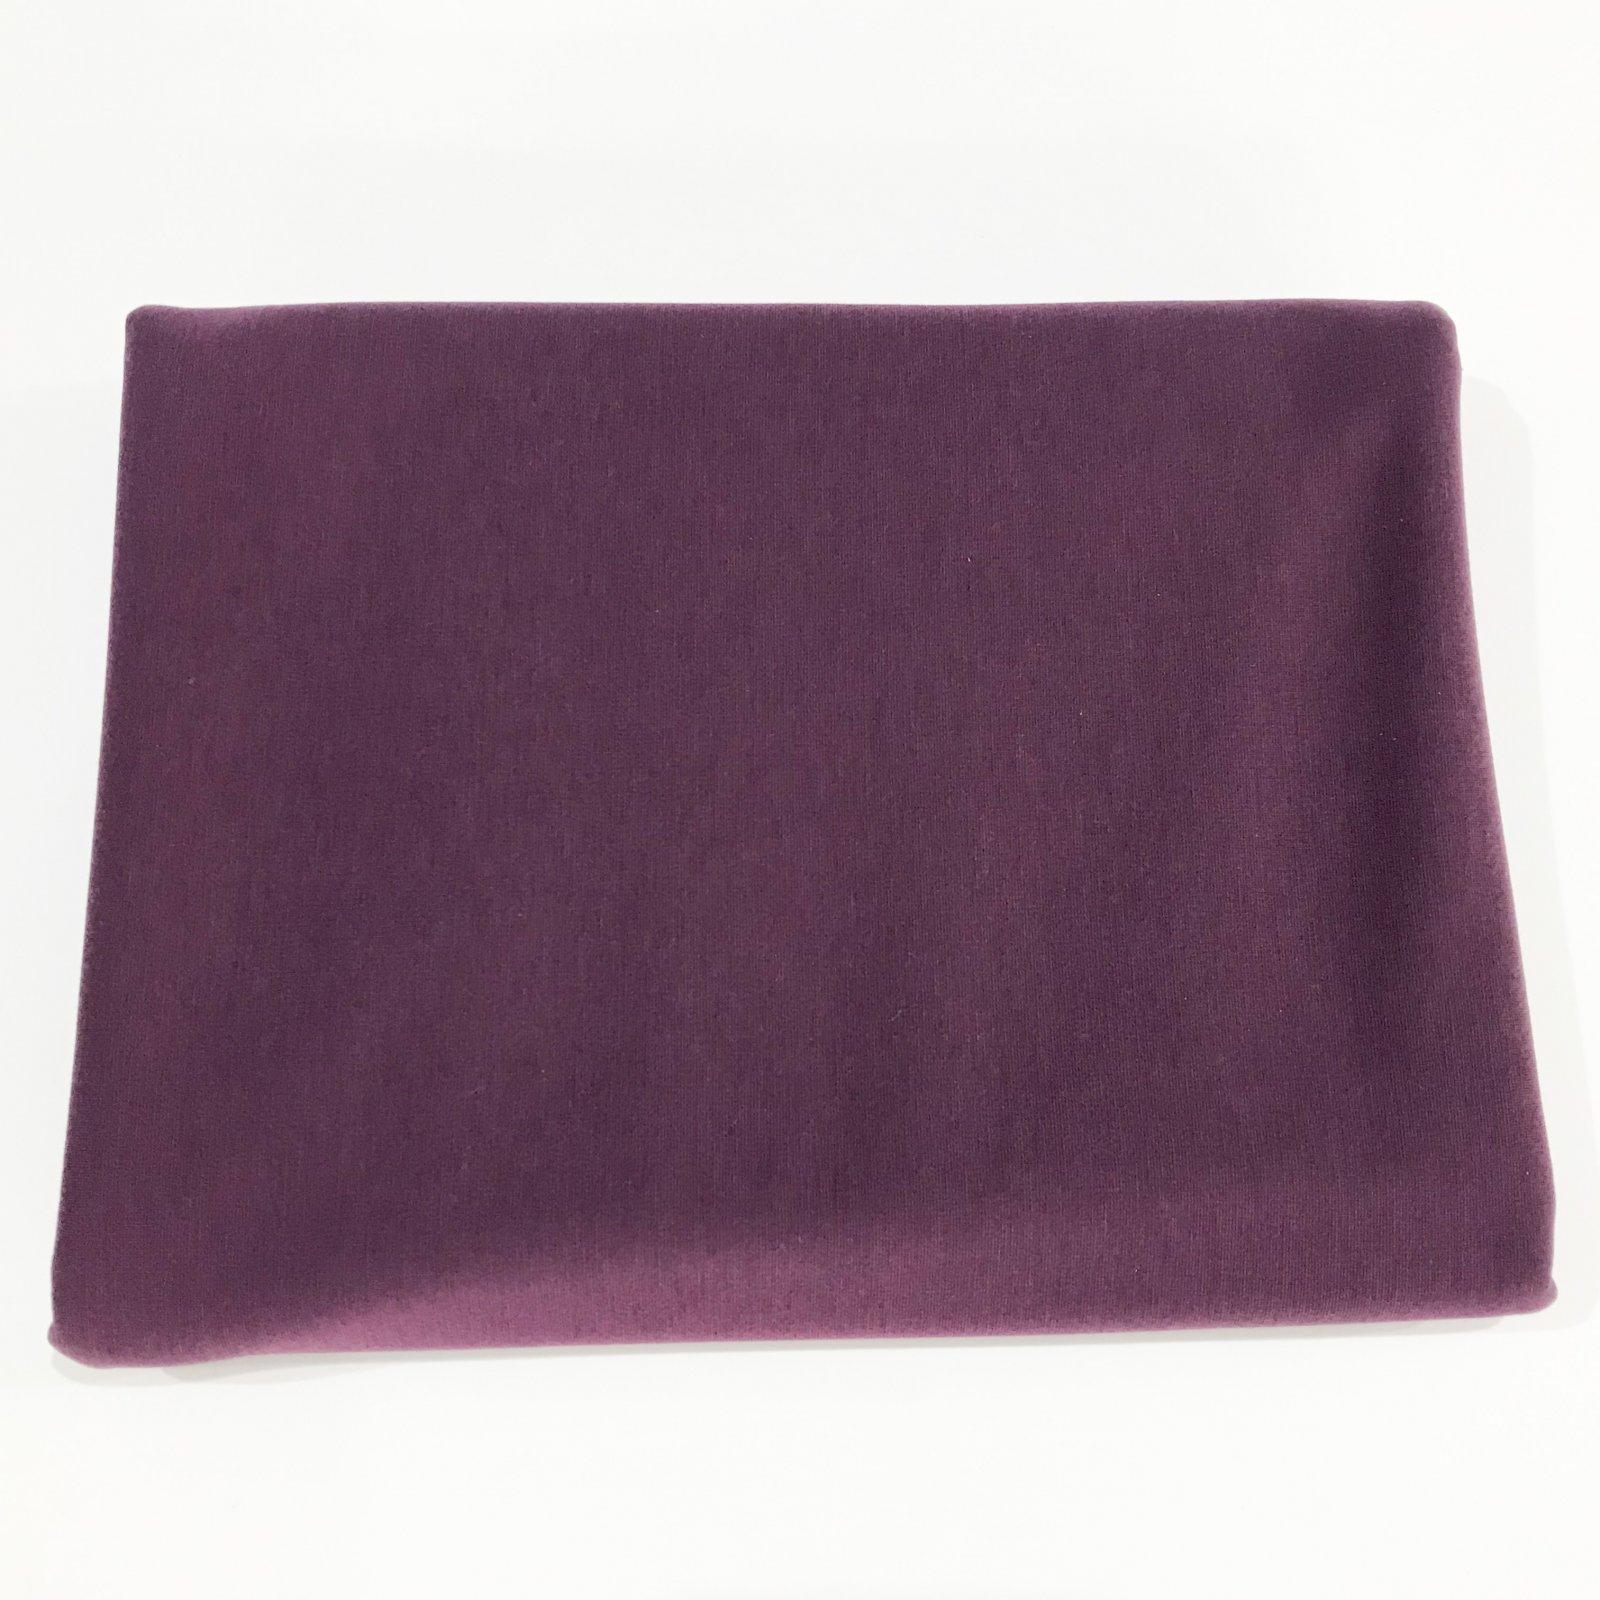 2 1/4 yard - Ponte - Deep Purple